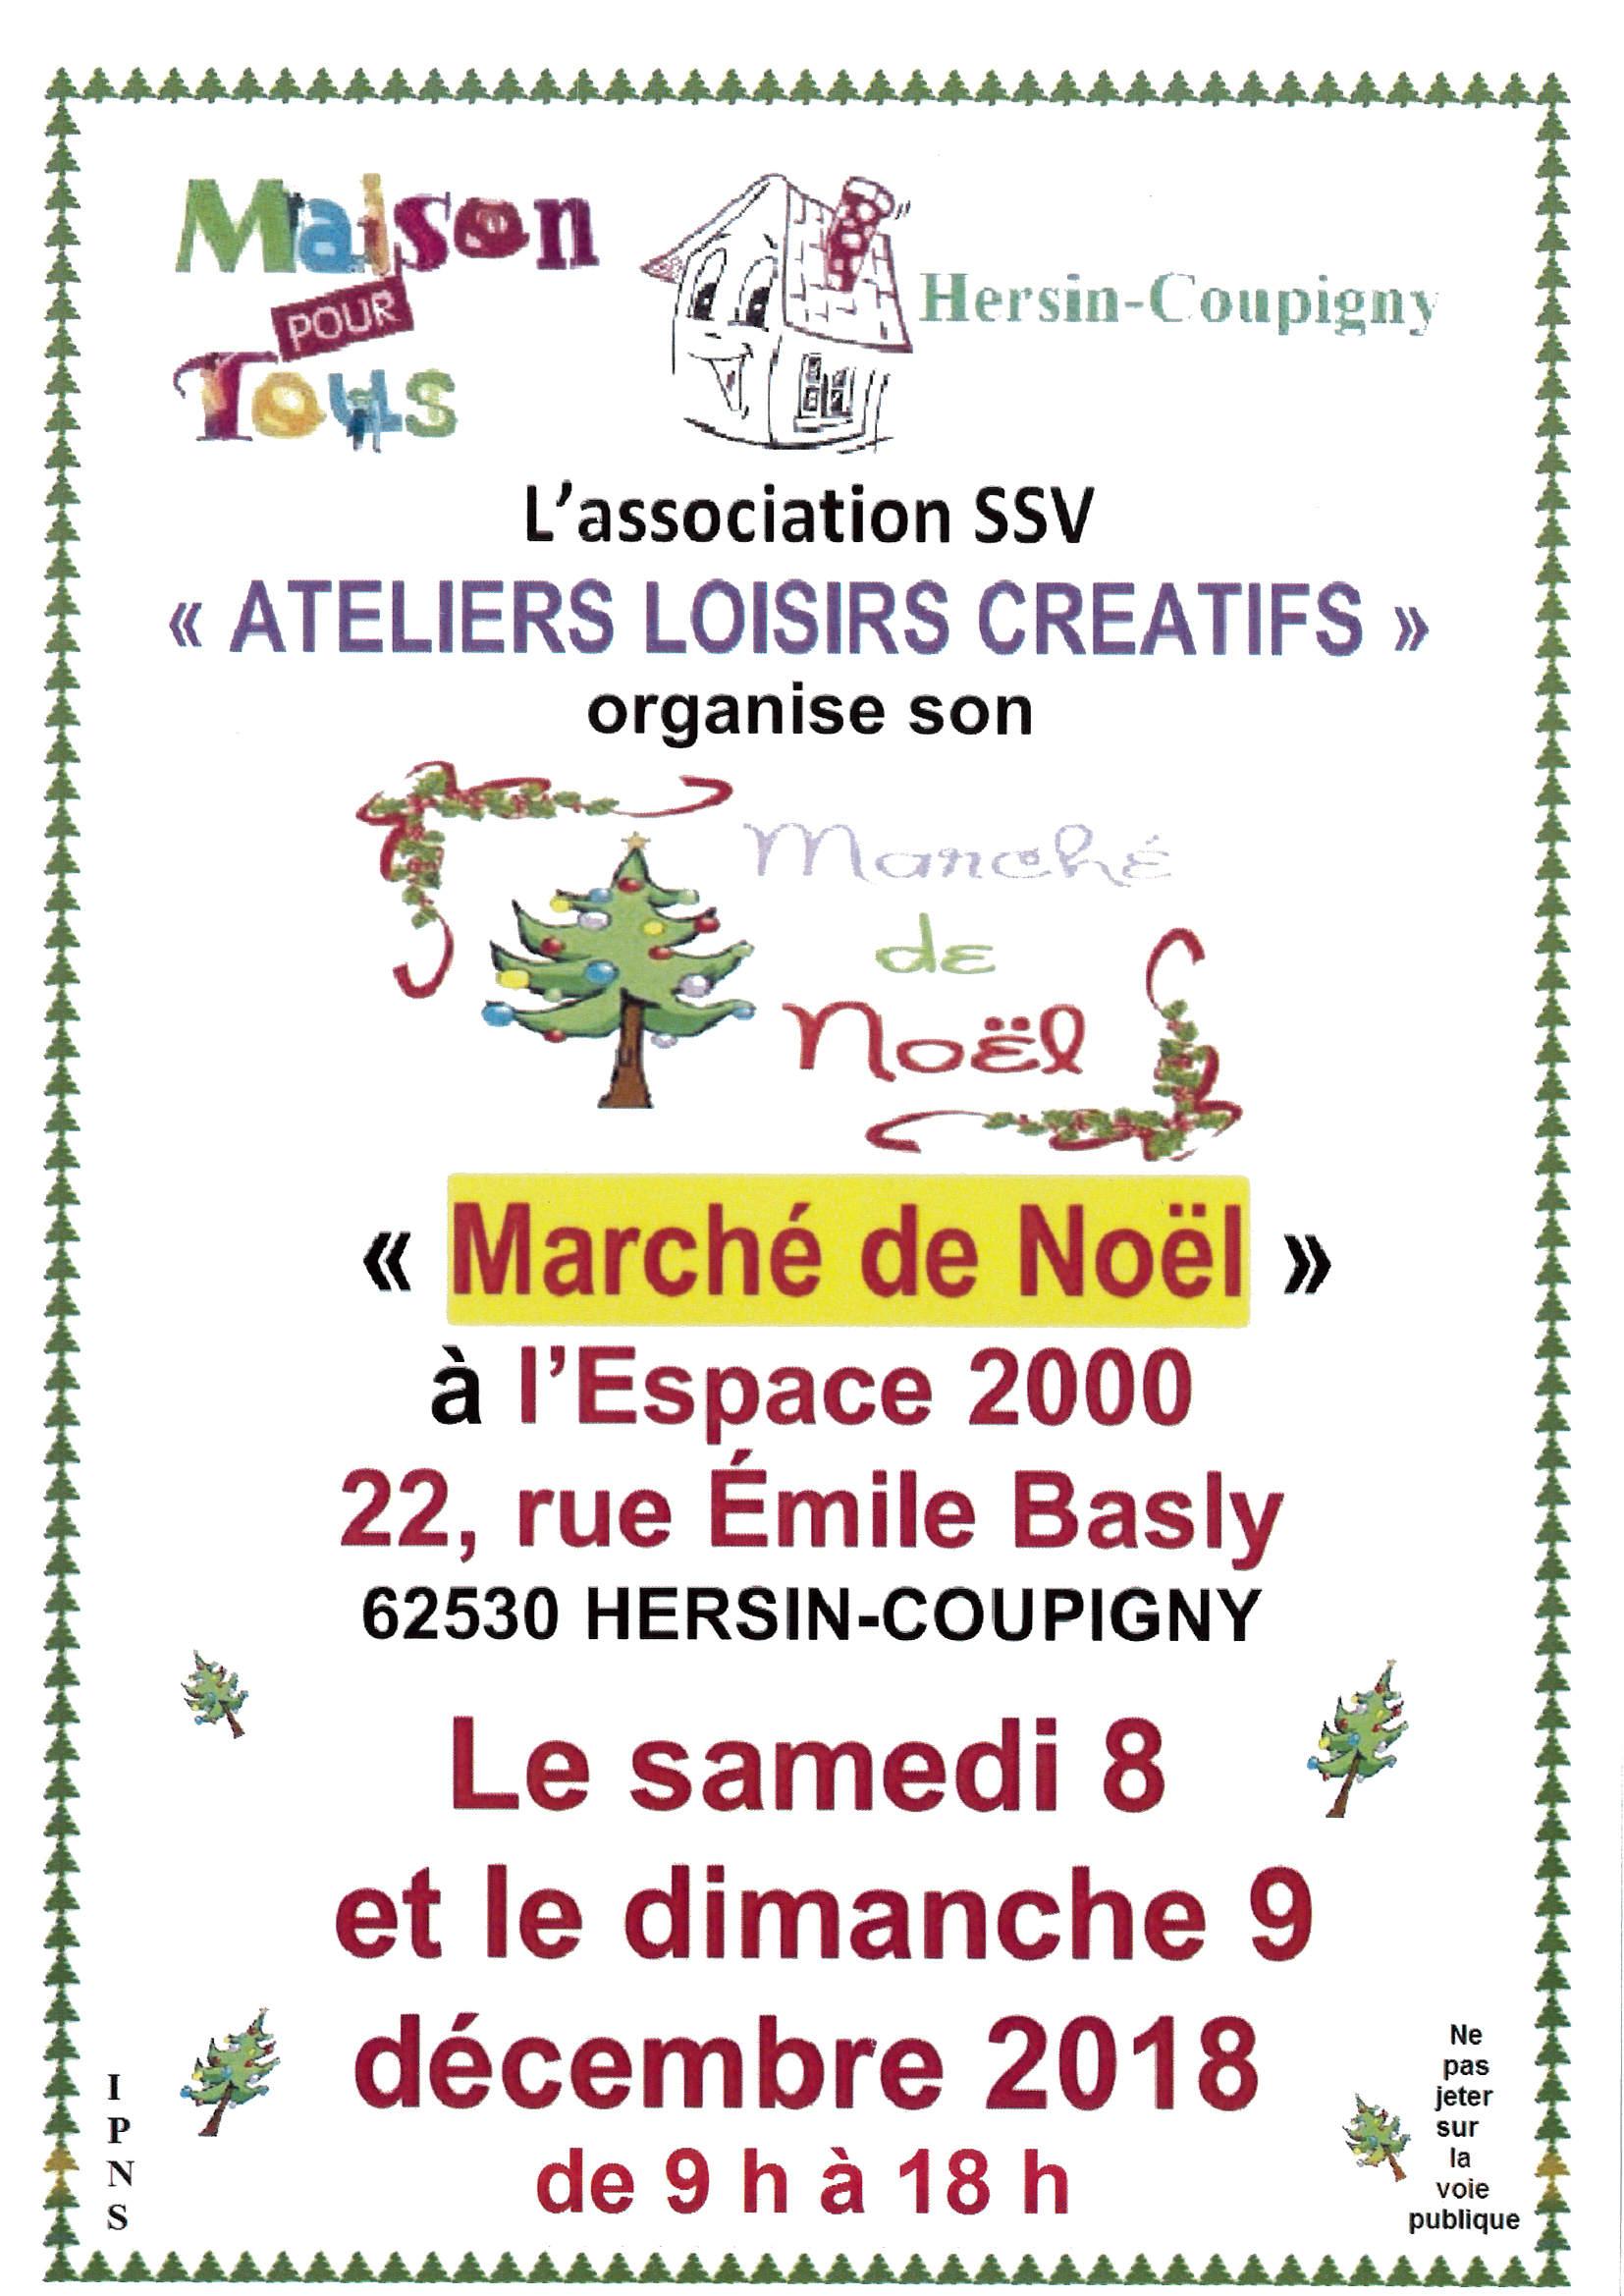 Marché de noel 8dec2018